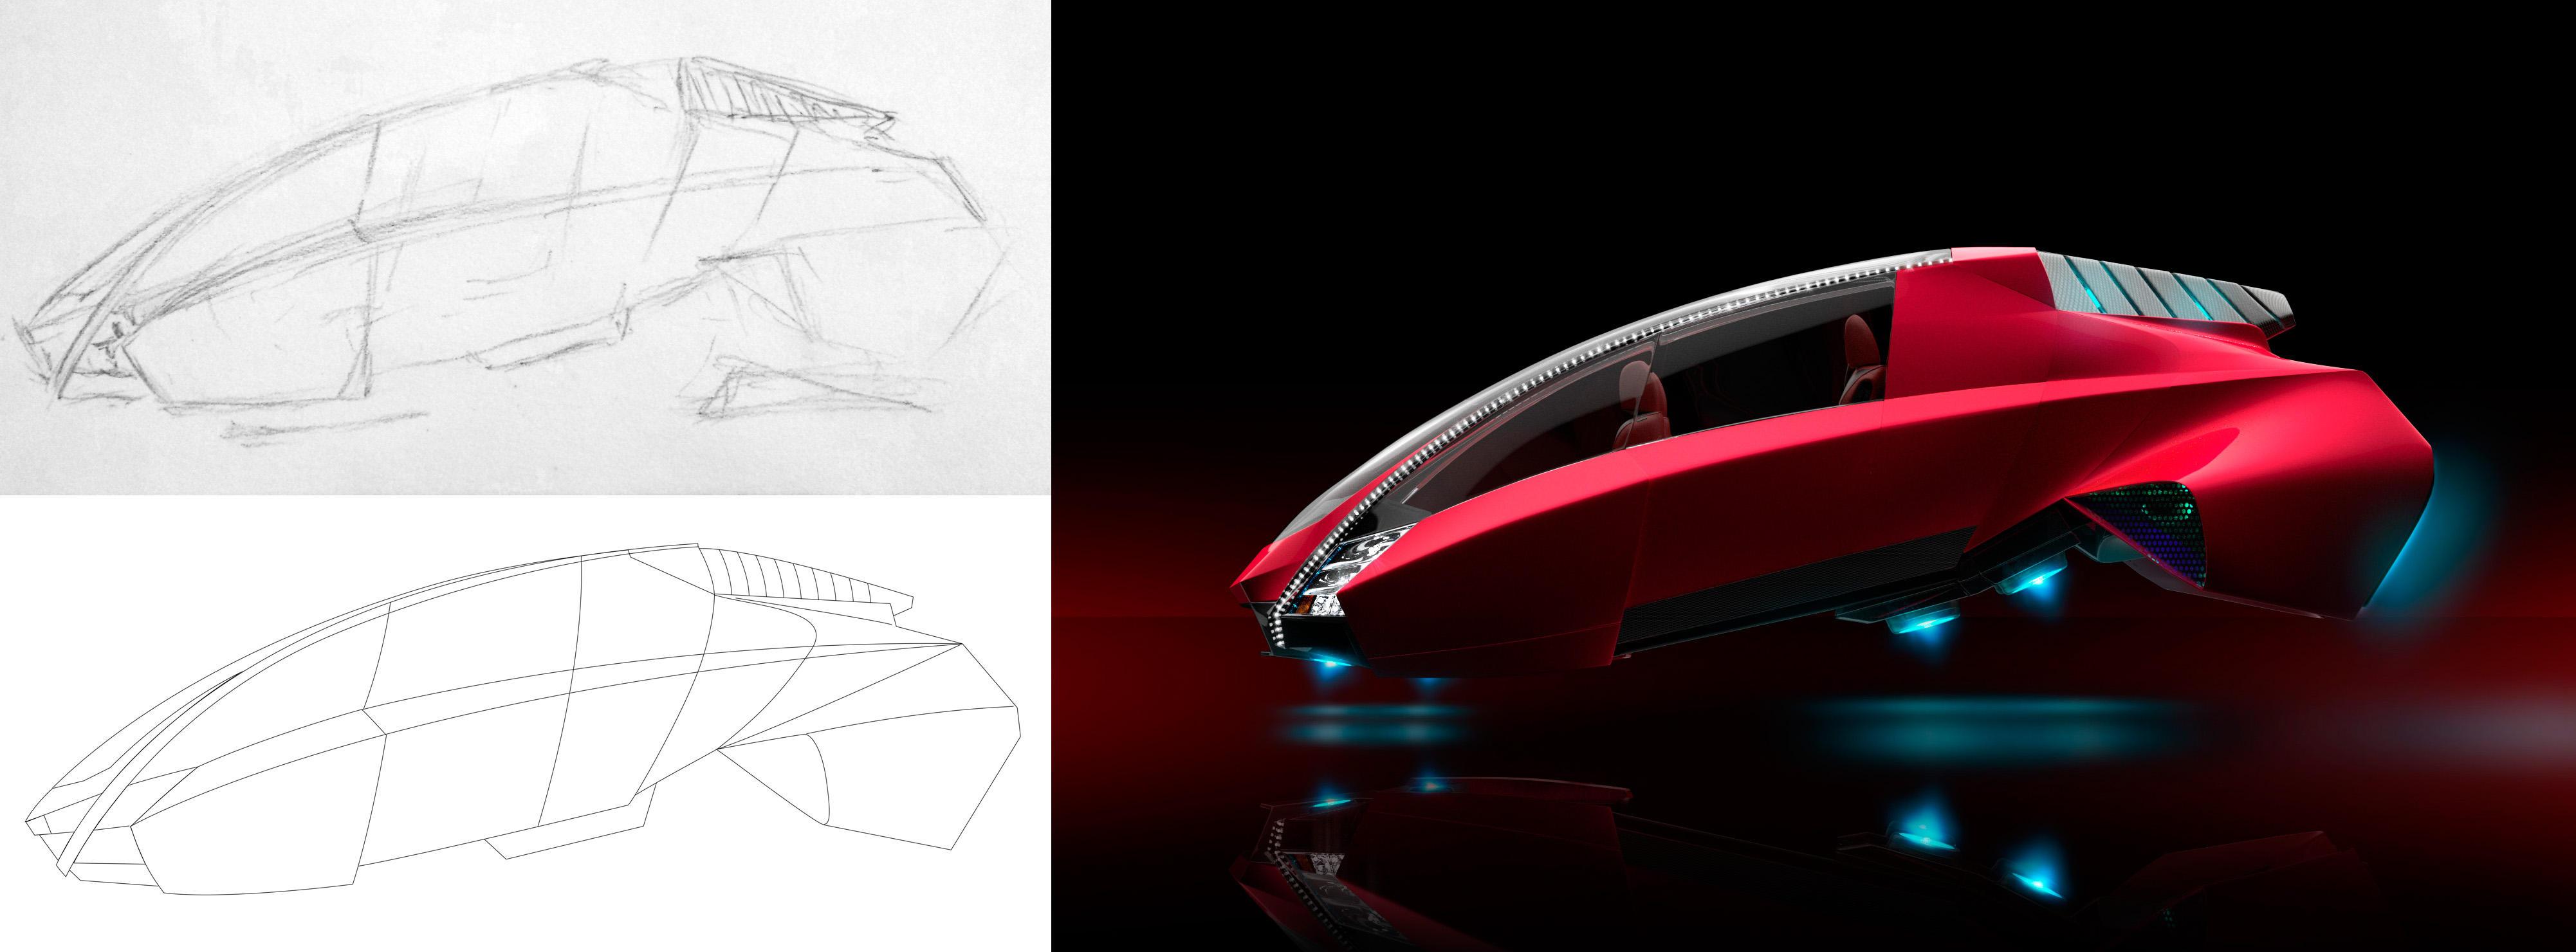 Concept Car by reinohvp